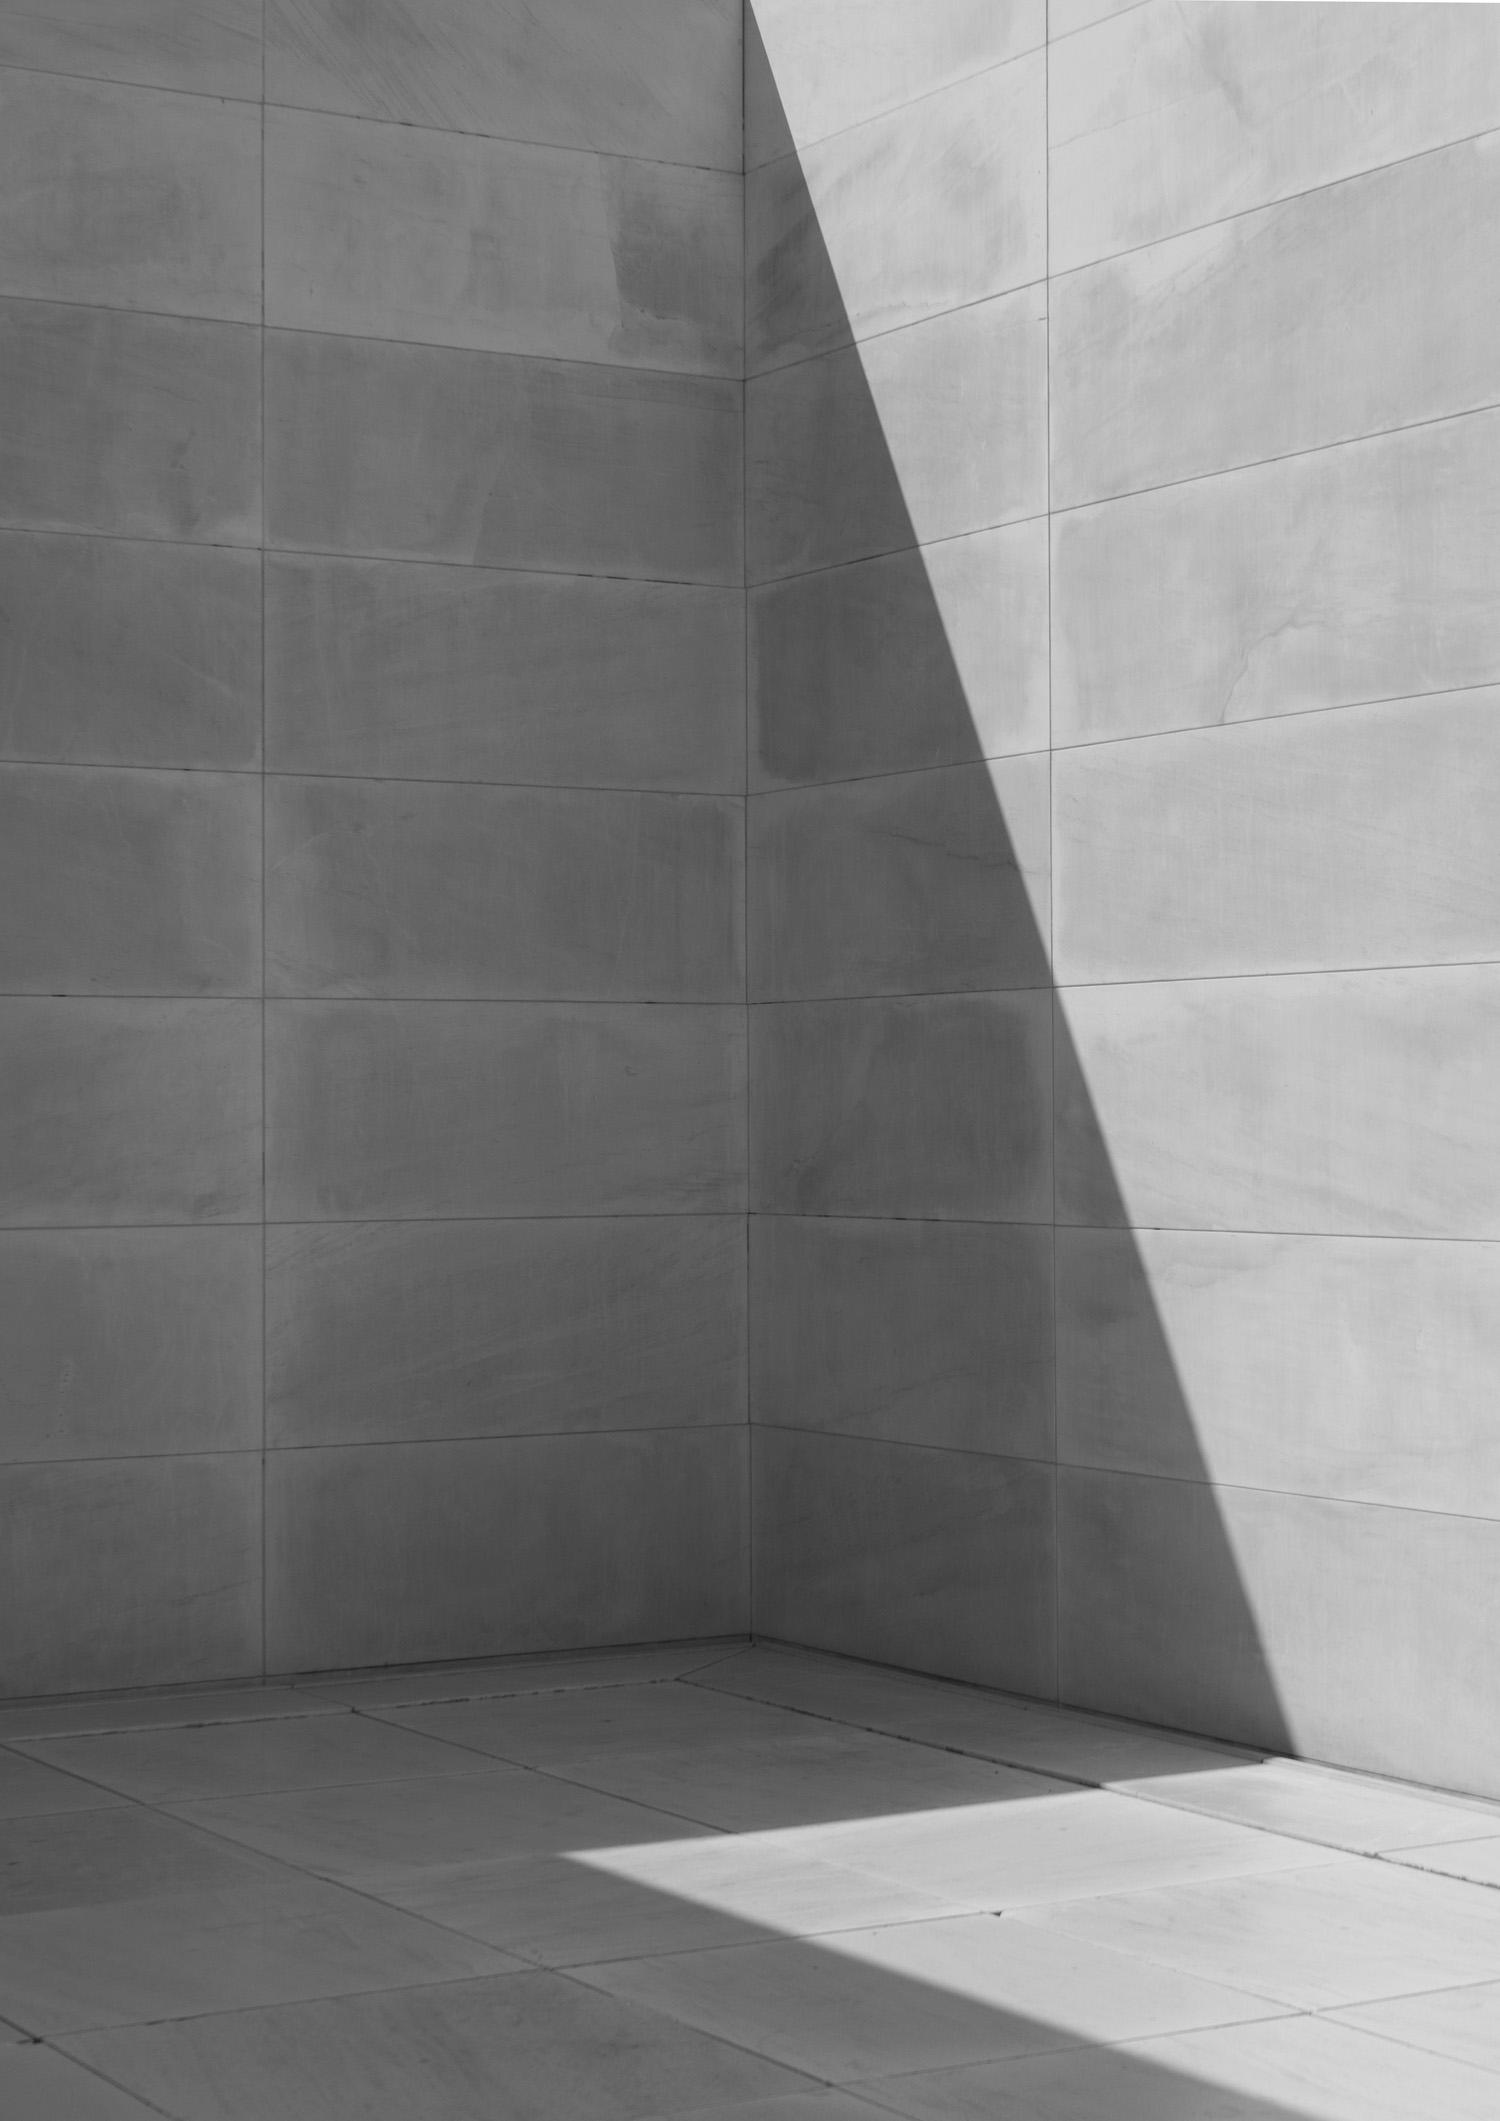 Emily-Grundon_architecture_spaces_0031.jpg